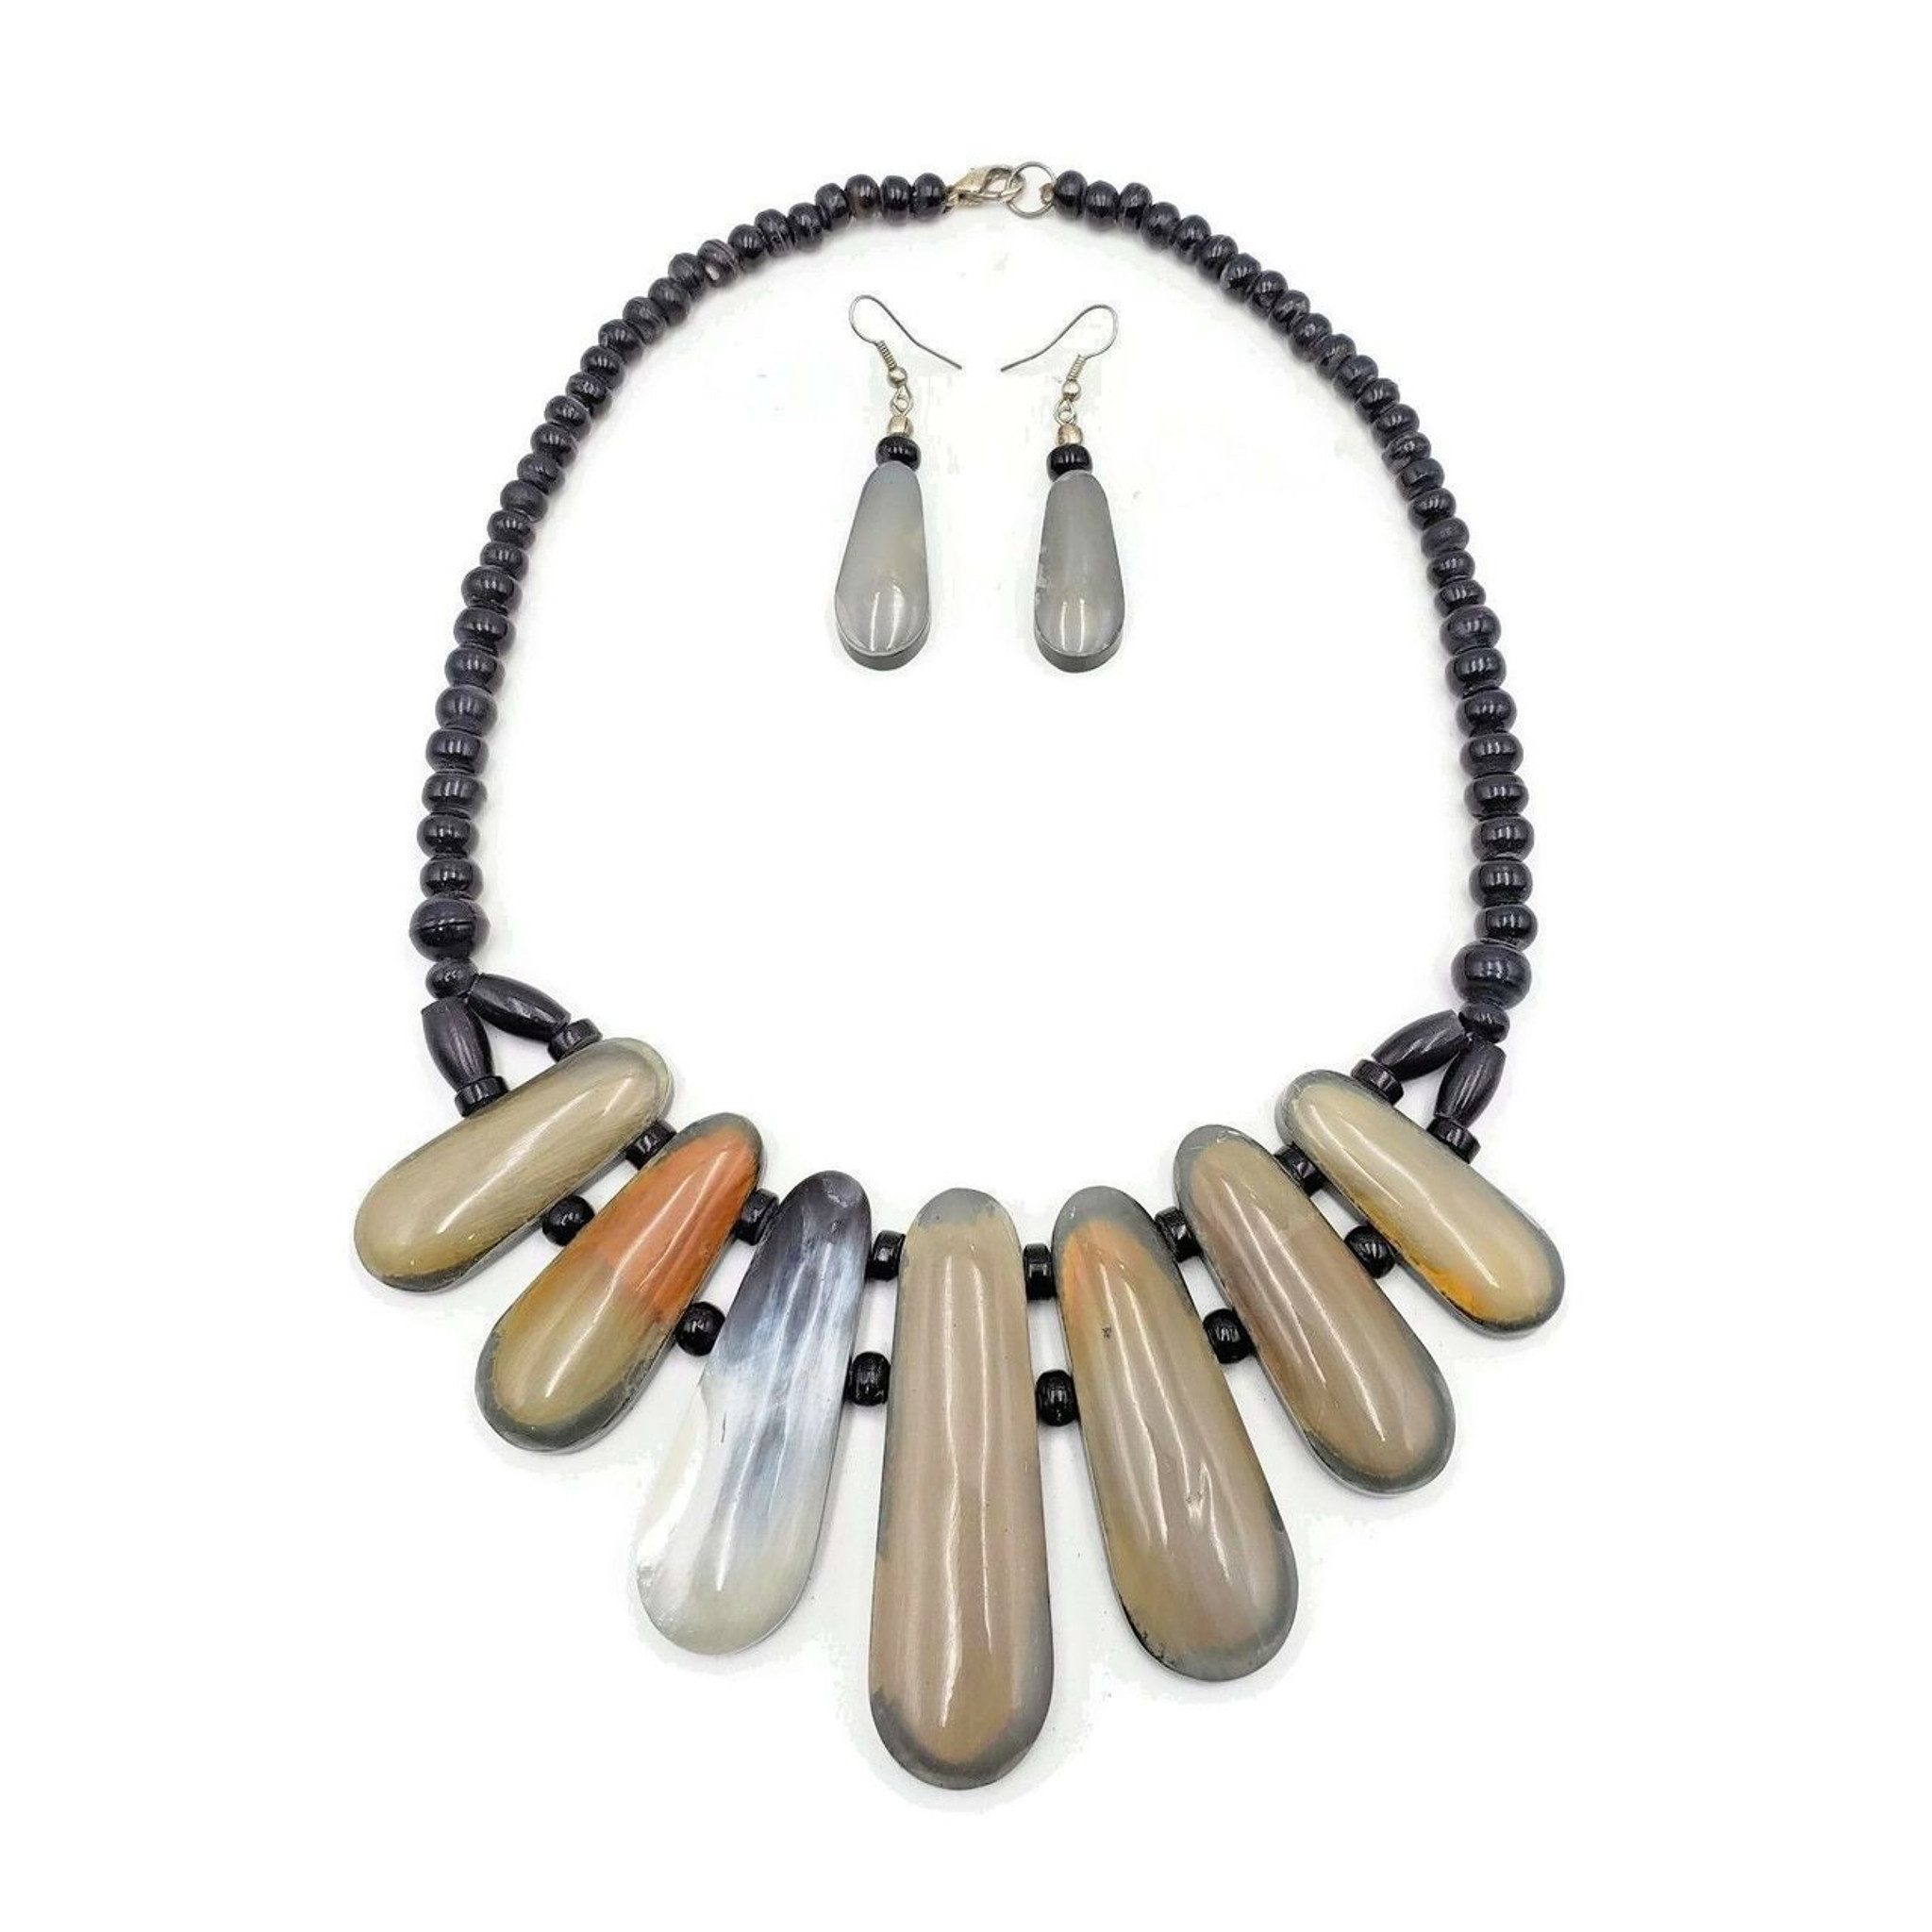 Zenia Fashionable Statement Bubble Bib Necklace and Matching Earrings